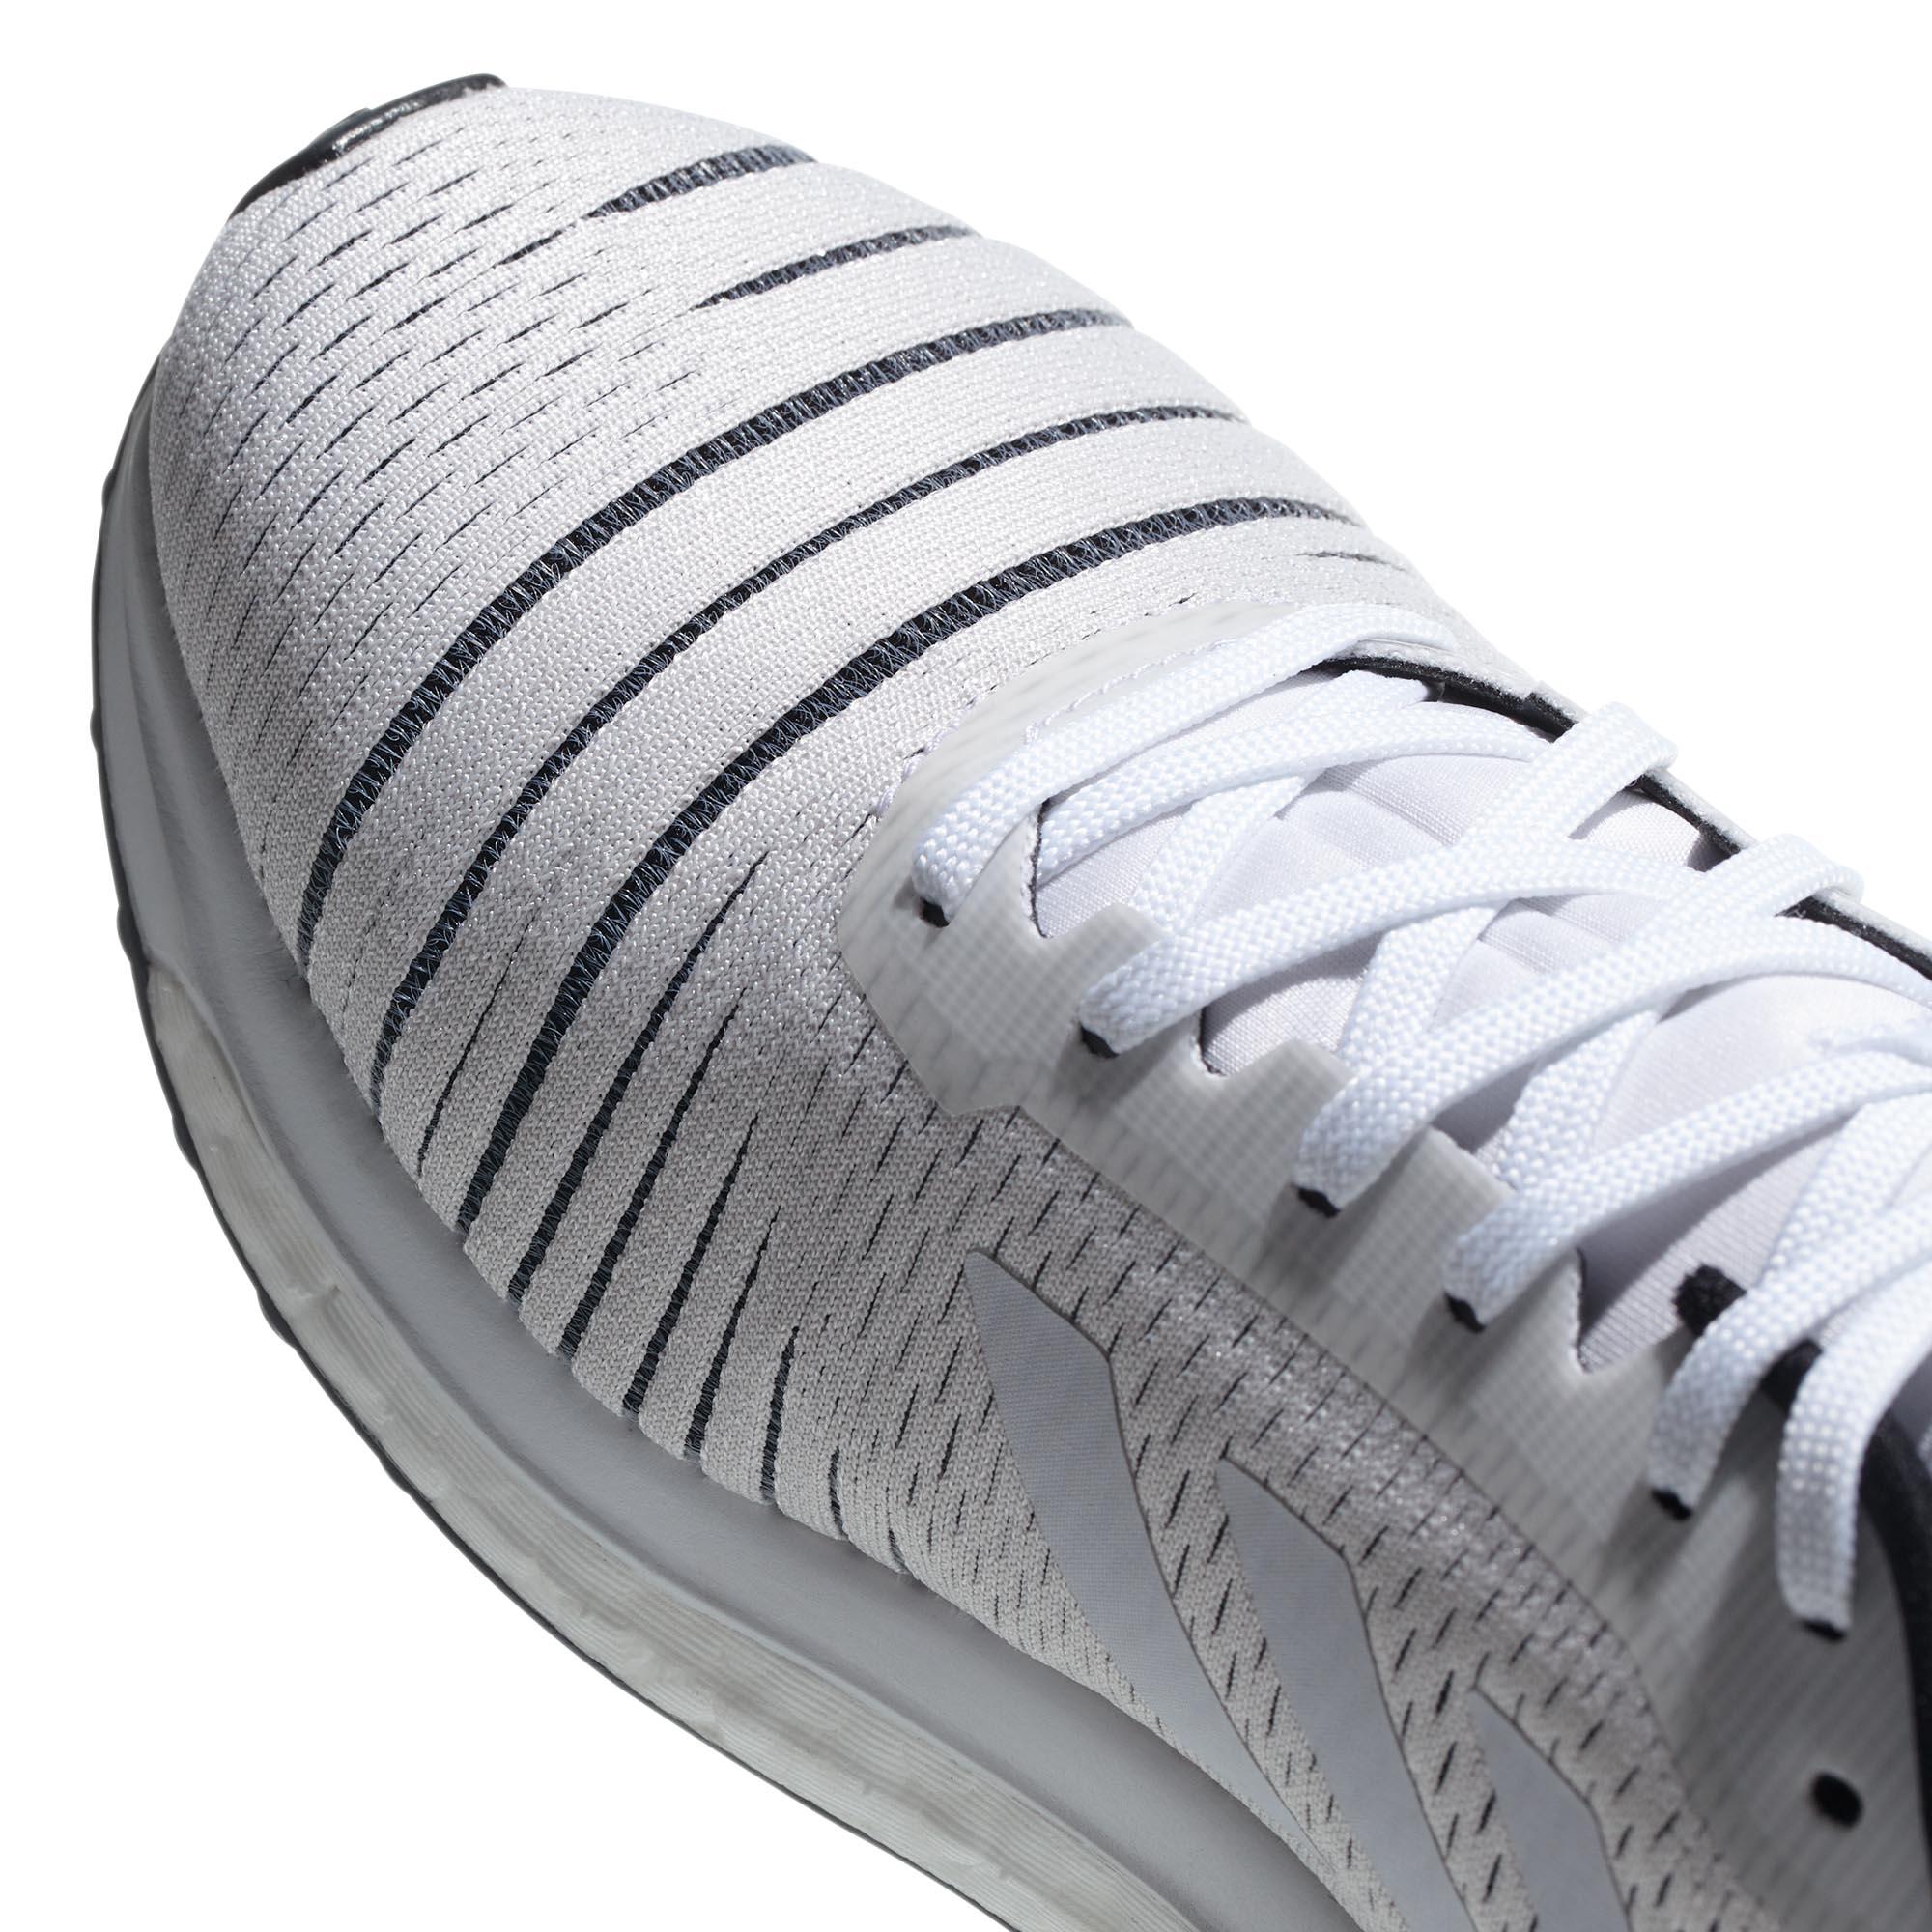 timeless design b8e4d 8430b Adidas Solar Drive mujeres correr Fitness entrenador zapato blanco